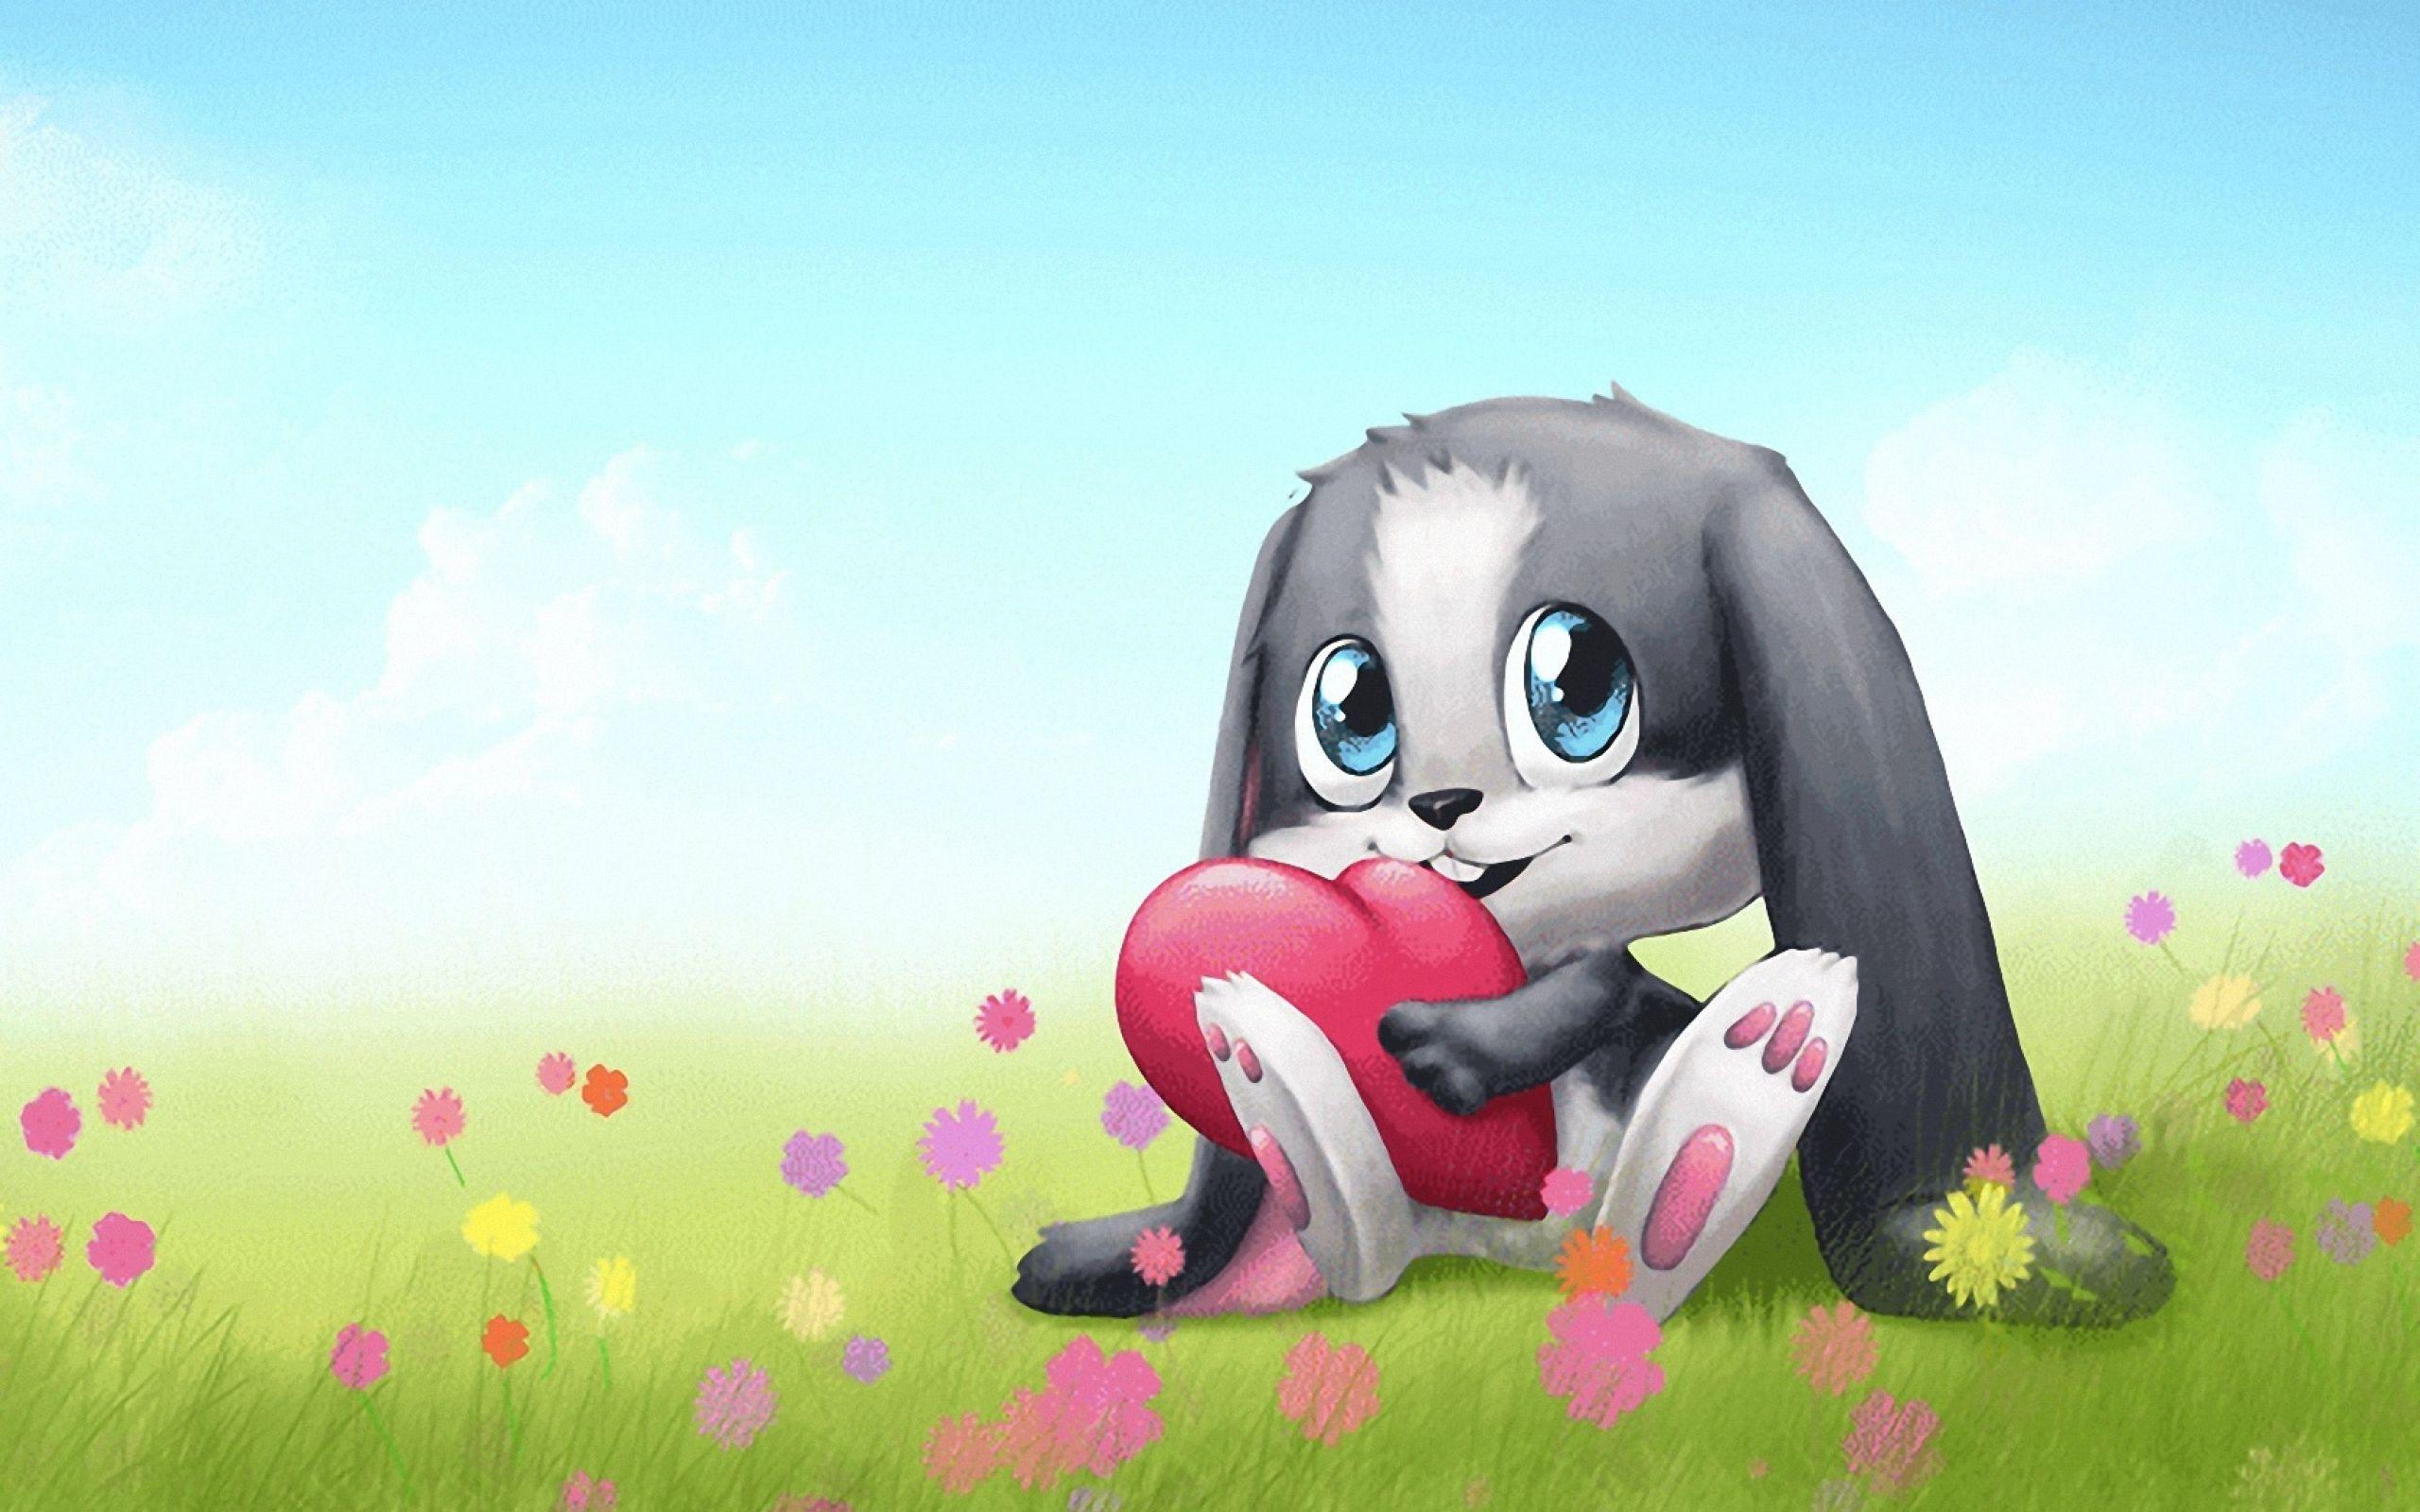 cute bunny cartoon hd wallpapers for windows 8 Wallpaper